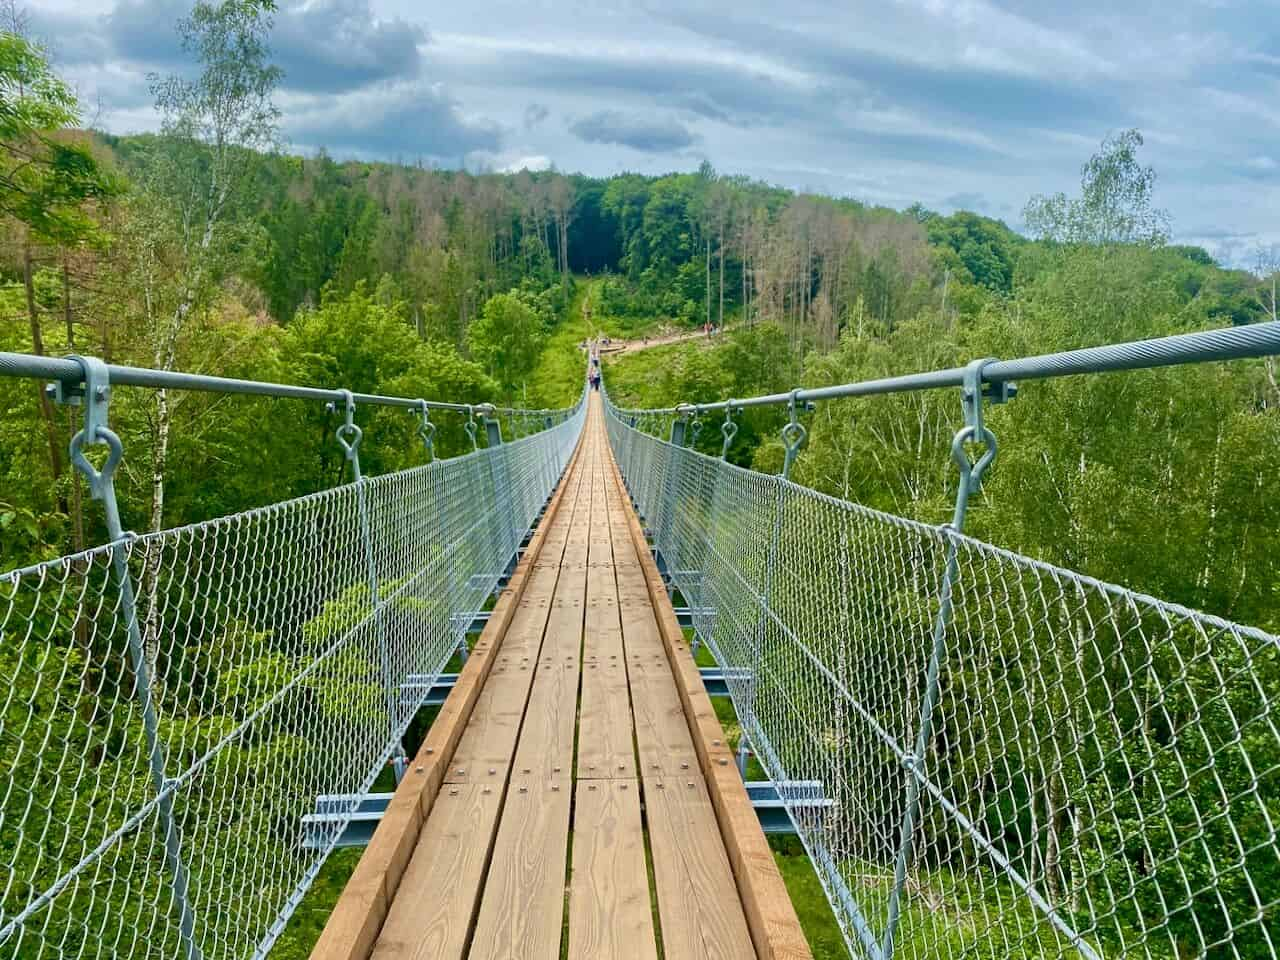 Hängeseilbrücke Hohe Schrecke